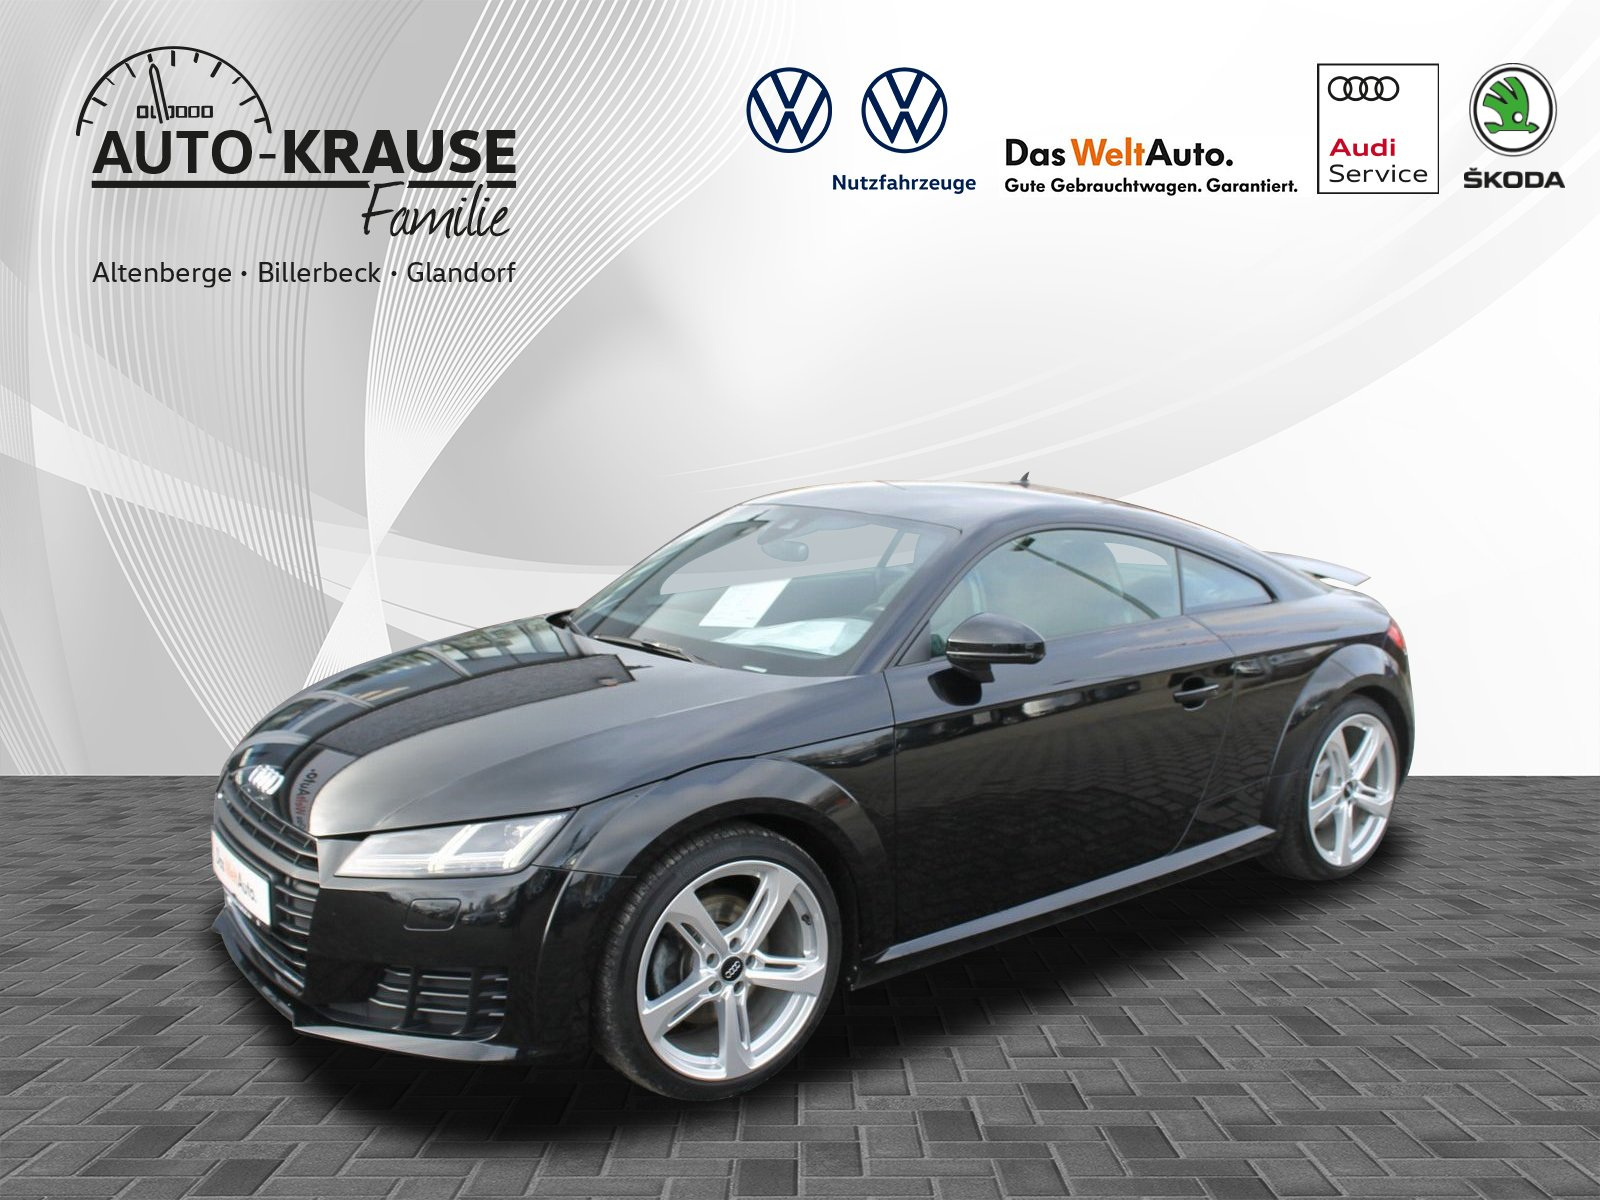 Audi TT 2.0 TFSI Coupe quattro S-Tronic B & O Sound, Jahr 2015, Benzin